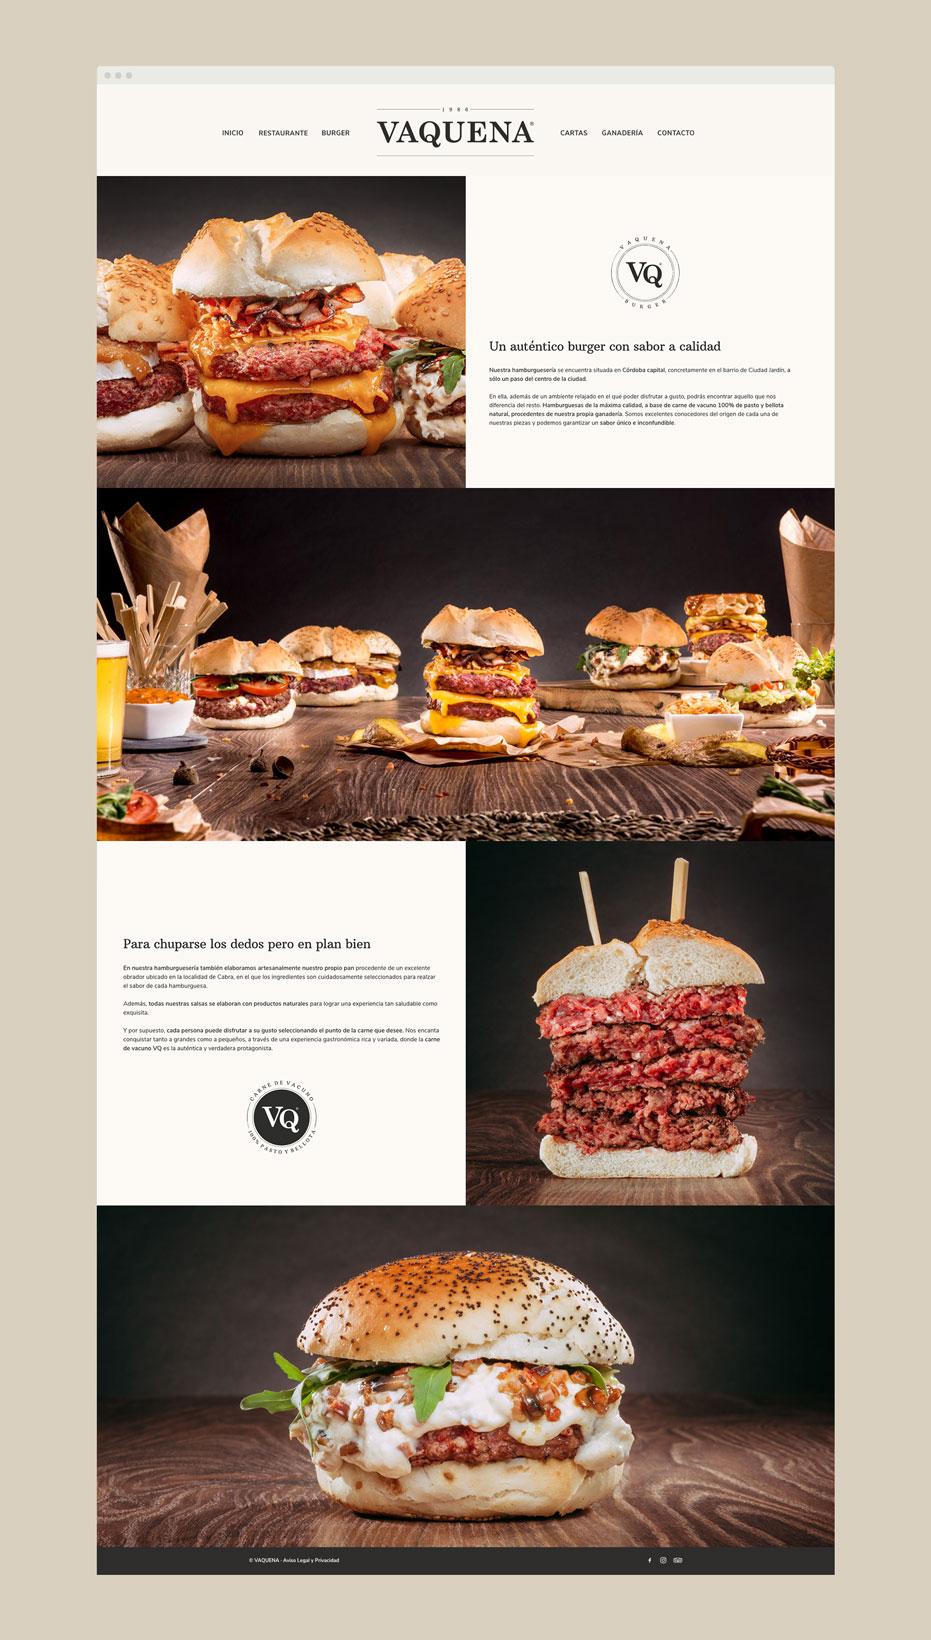 Diseño Web Vaquena Restaurante - www.vaquena.com - tabarestabares